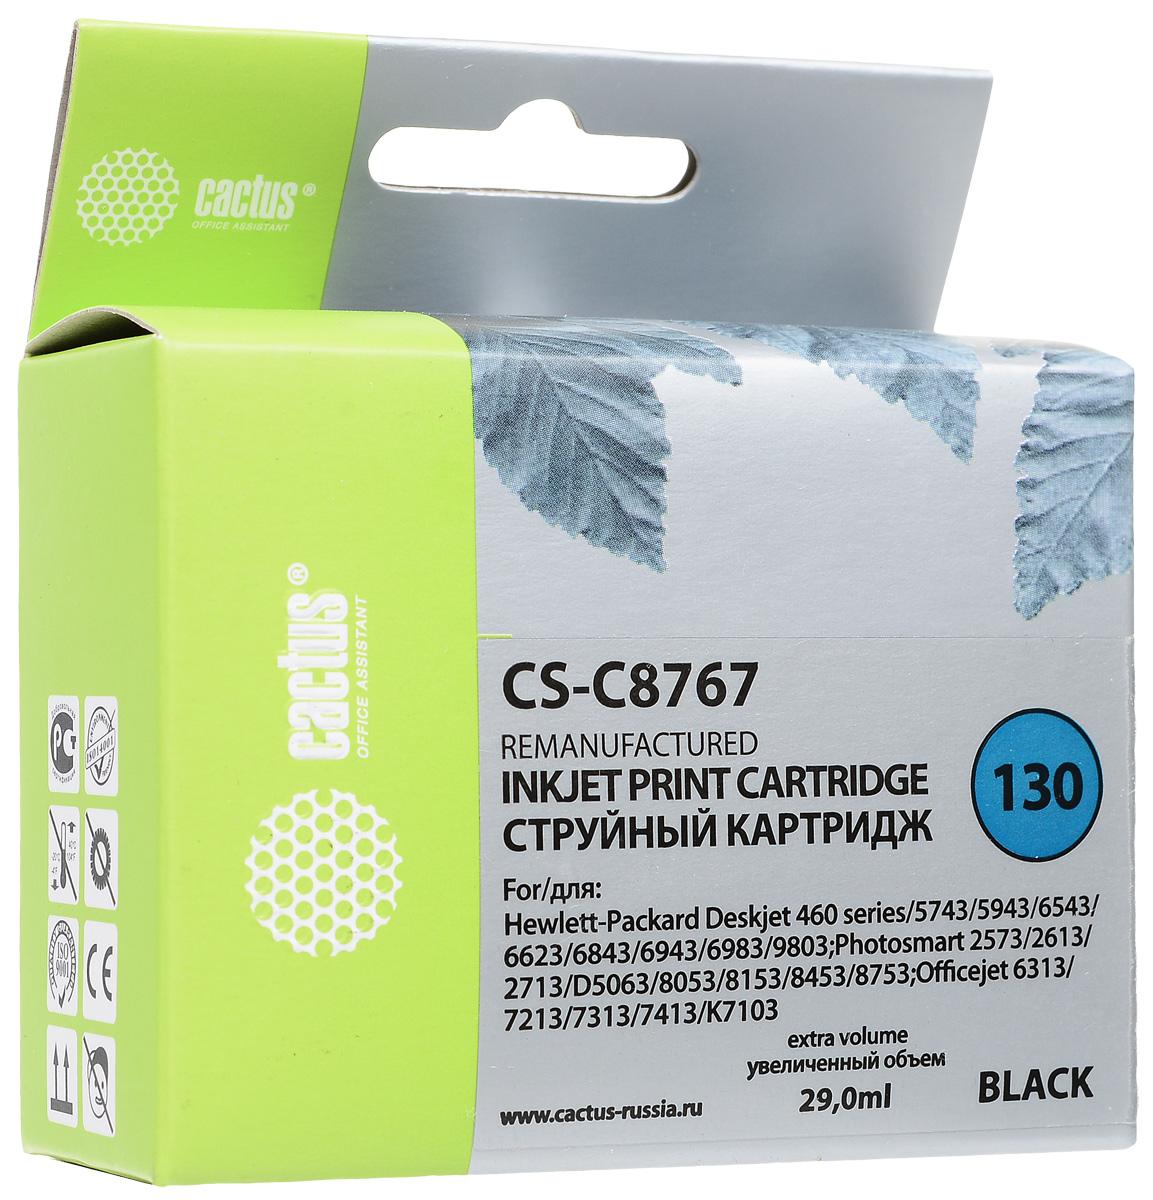 Cactus CS-C8767 №130, Black картридж струйный для HP Deskjet 460series/5743/6543/9803/2573/D5063/8053/6313/7213/K7103 цена 2017